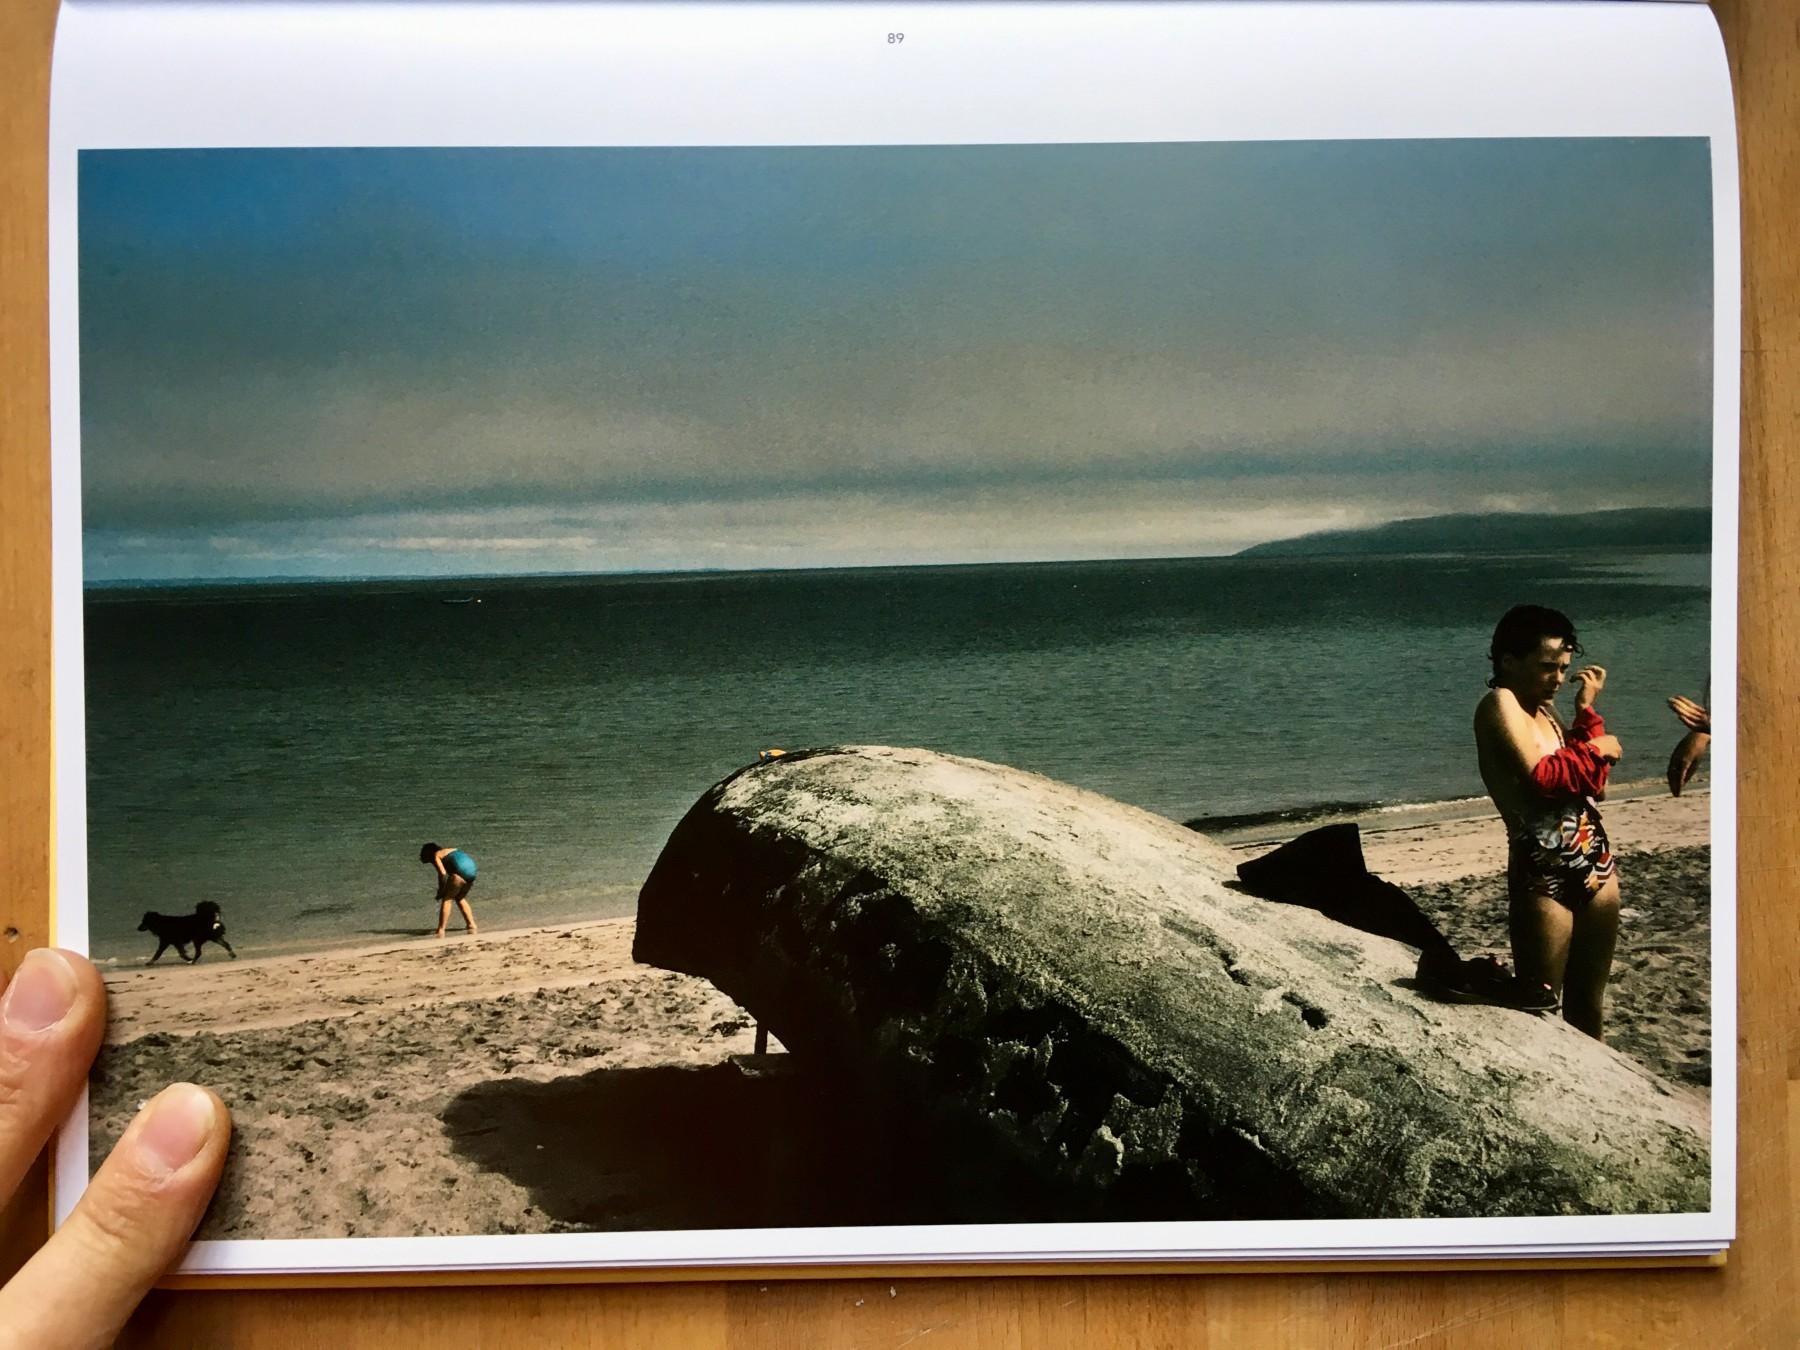 enster-blog-di-cultura-fotografica-harry-gruyaert-rivage-114.JPG